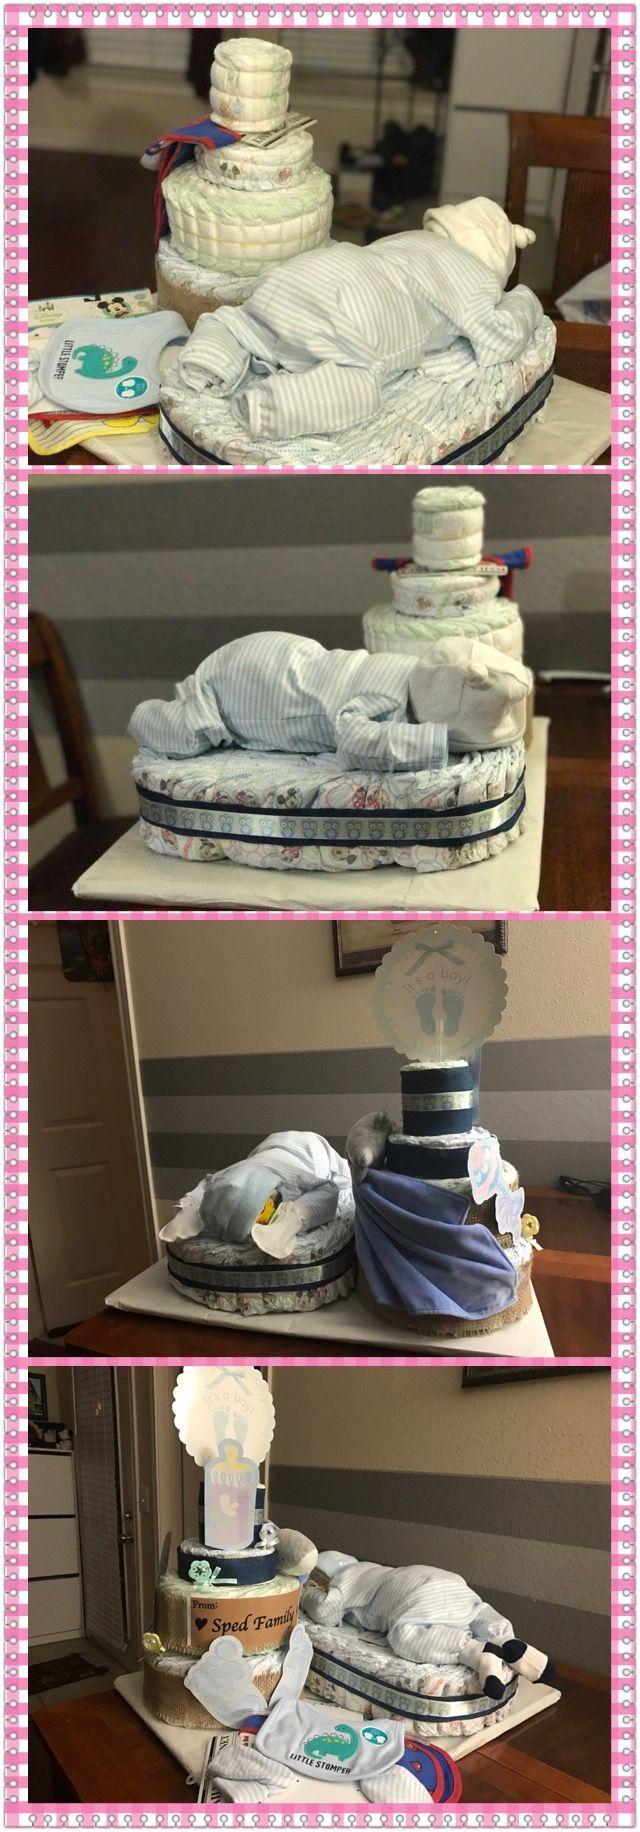 Baby diaper cake.